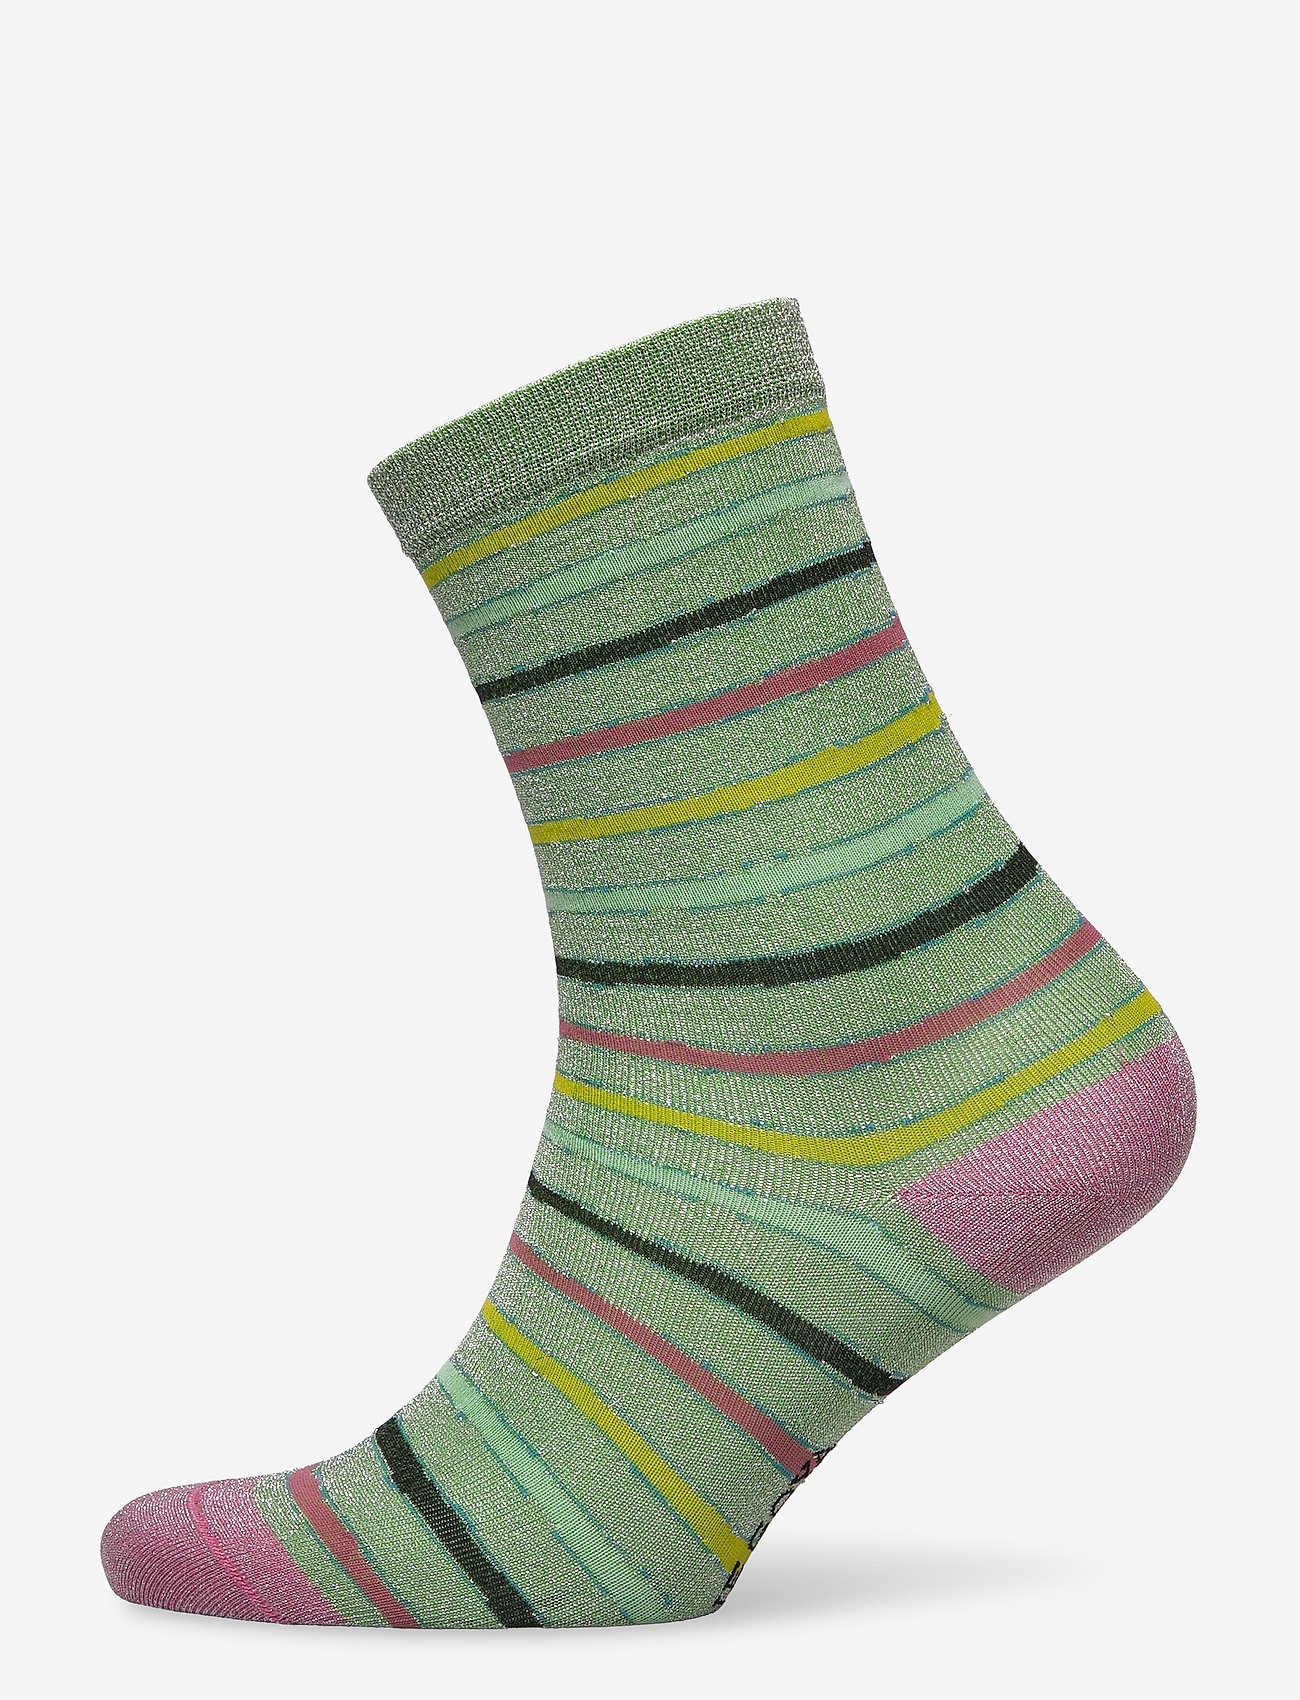 STINE GOYA - Caty, 1203 Socks - almindelige strømper - stripes green lurex - 0